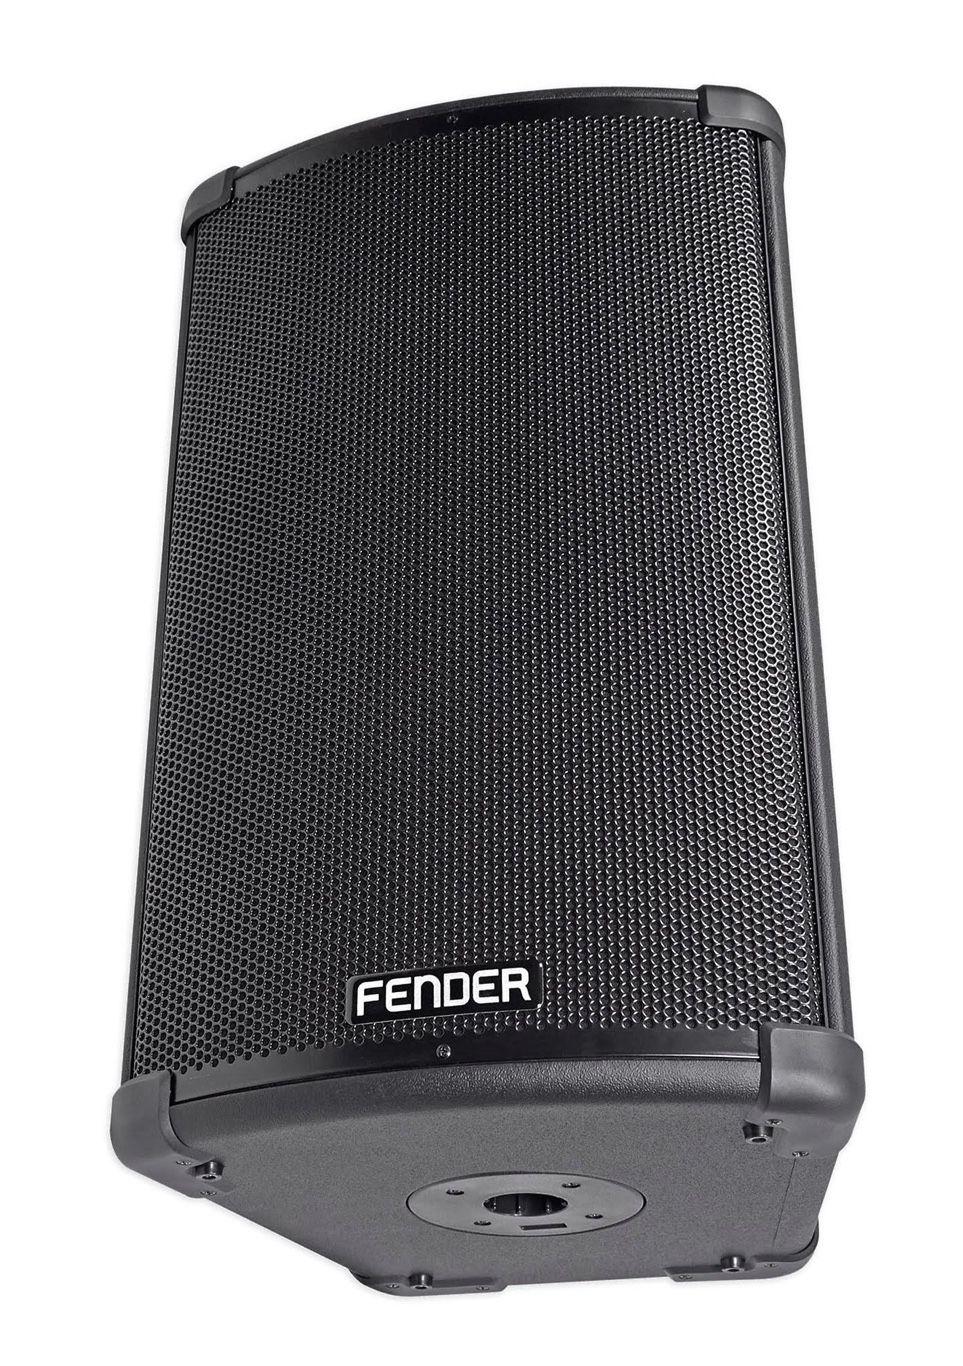 Fender fighter